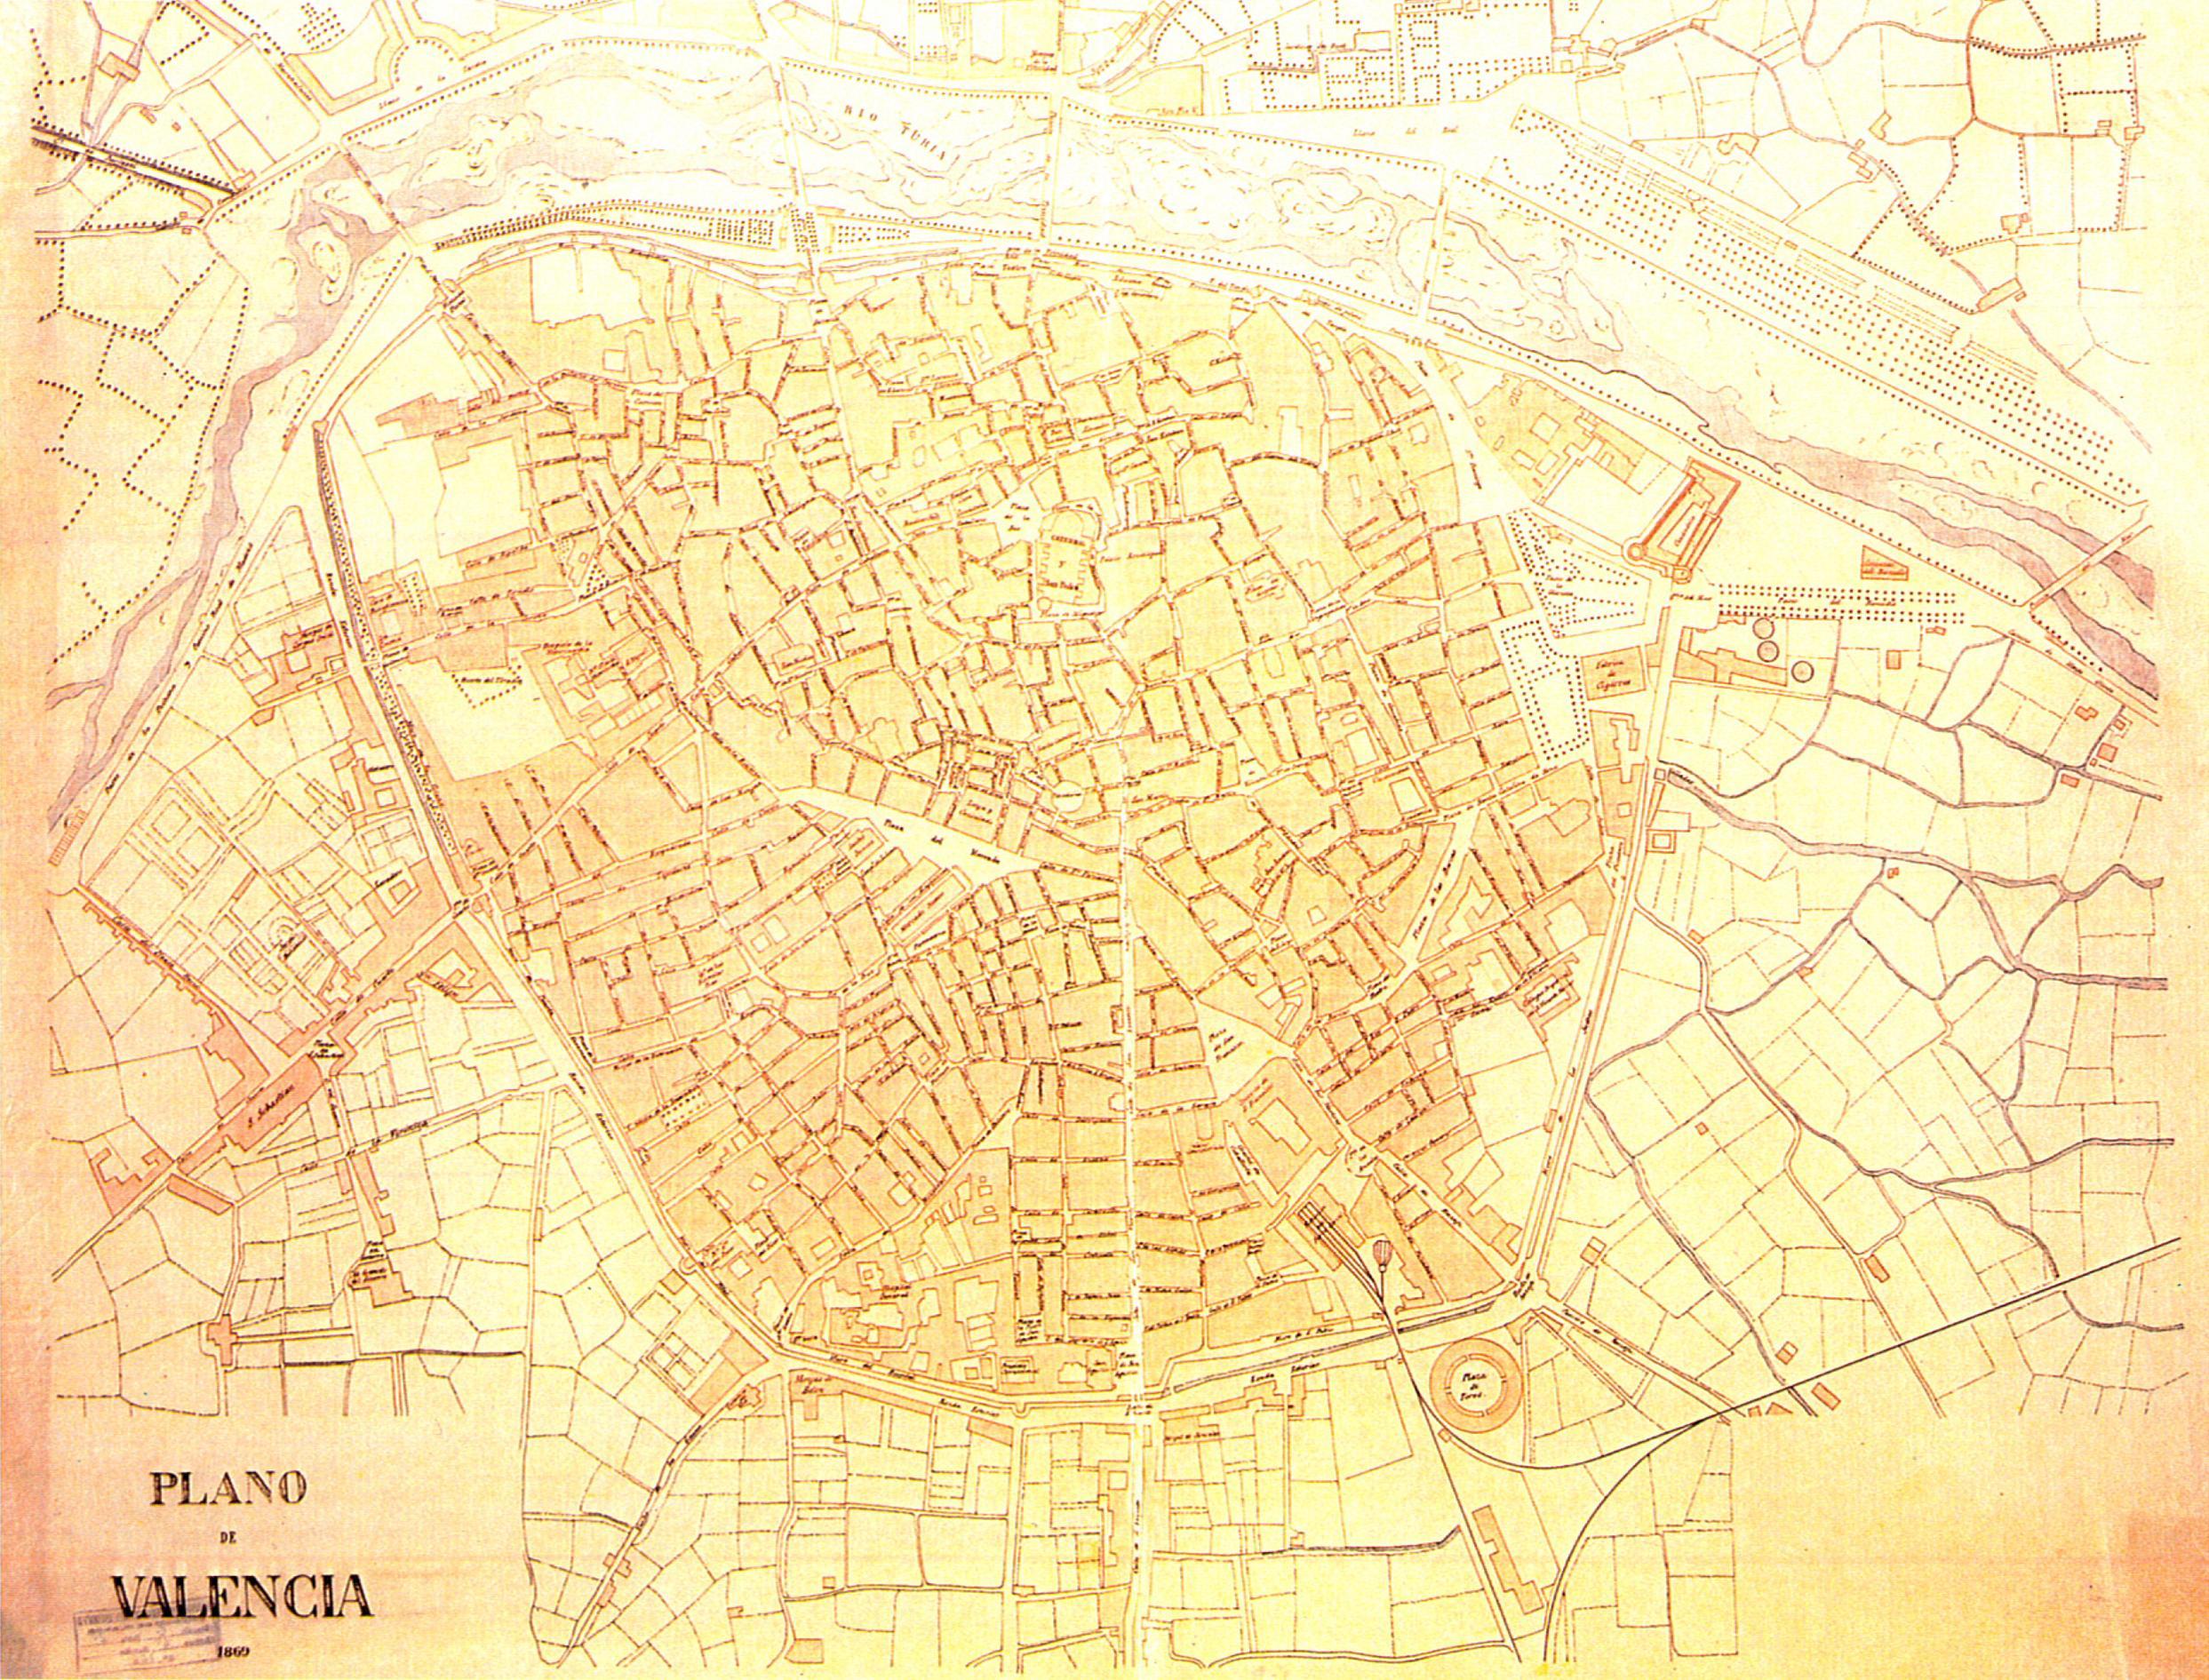 Plano de Valencia 1869